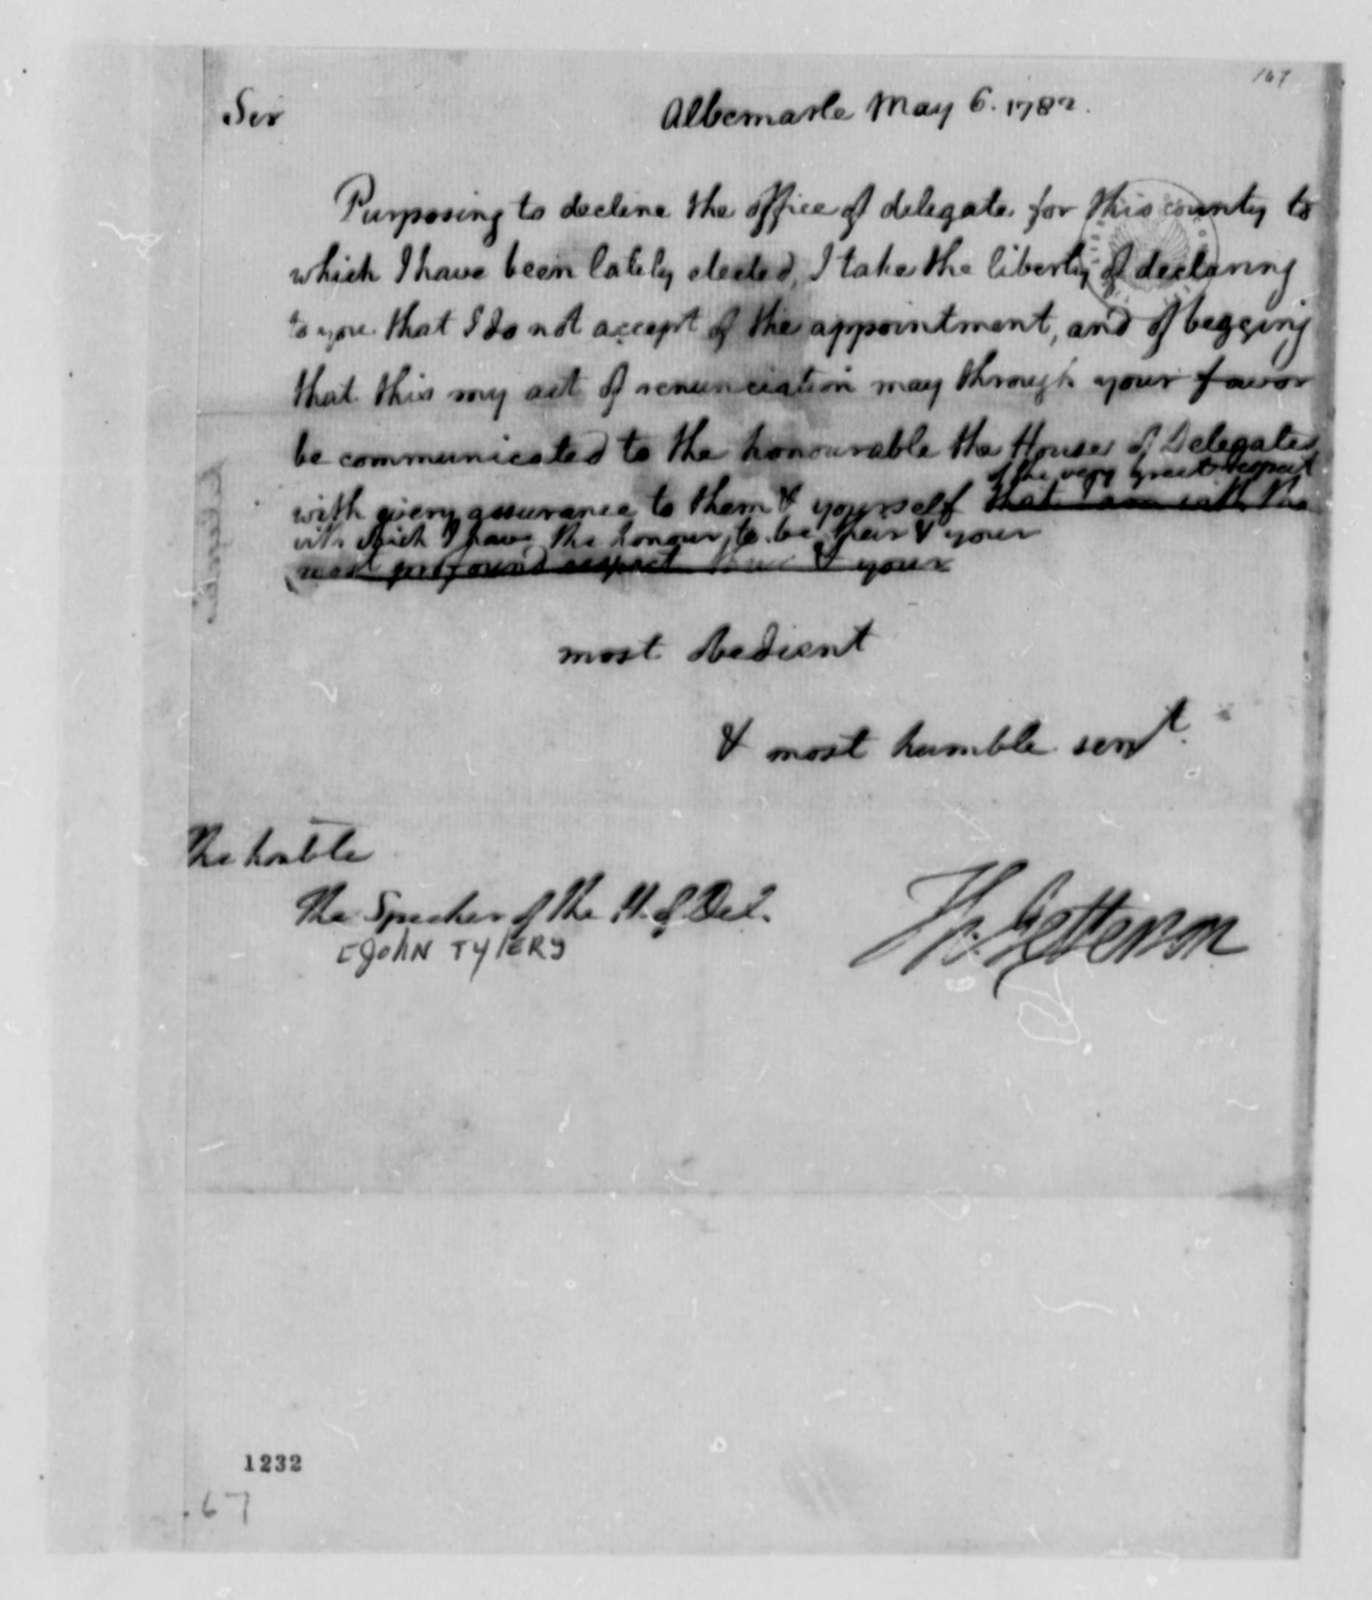 Thomas Jefferson to John Tyler, May 6, 1782